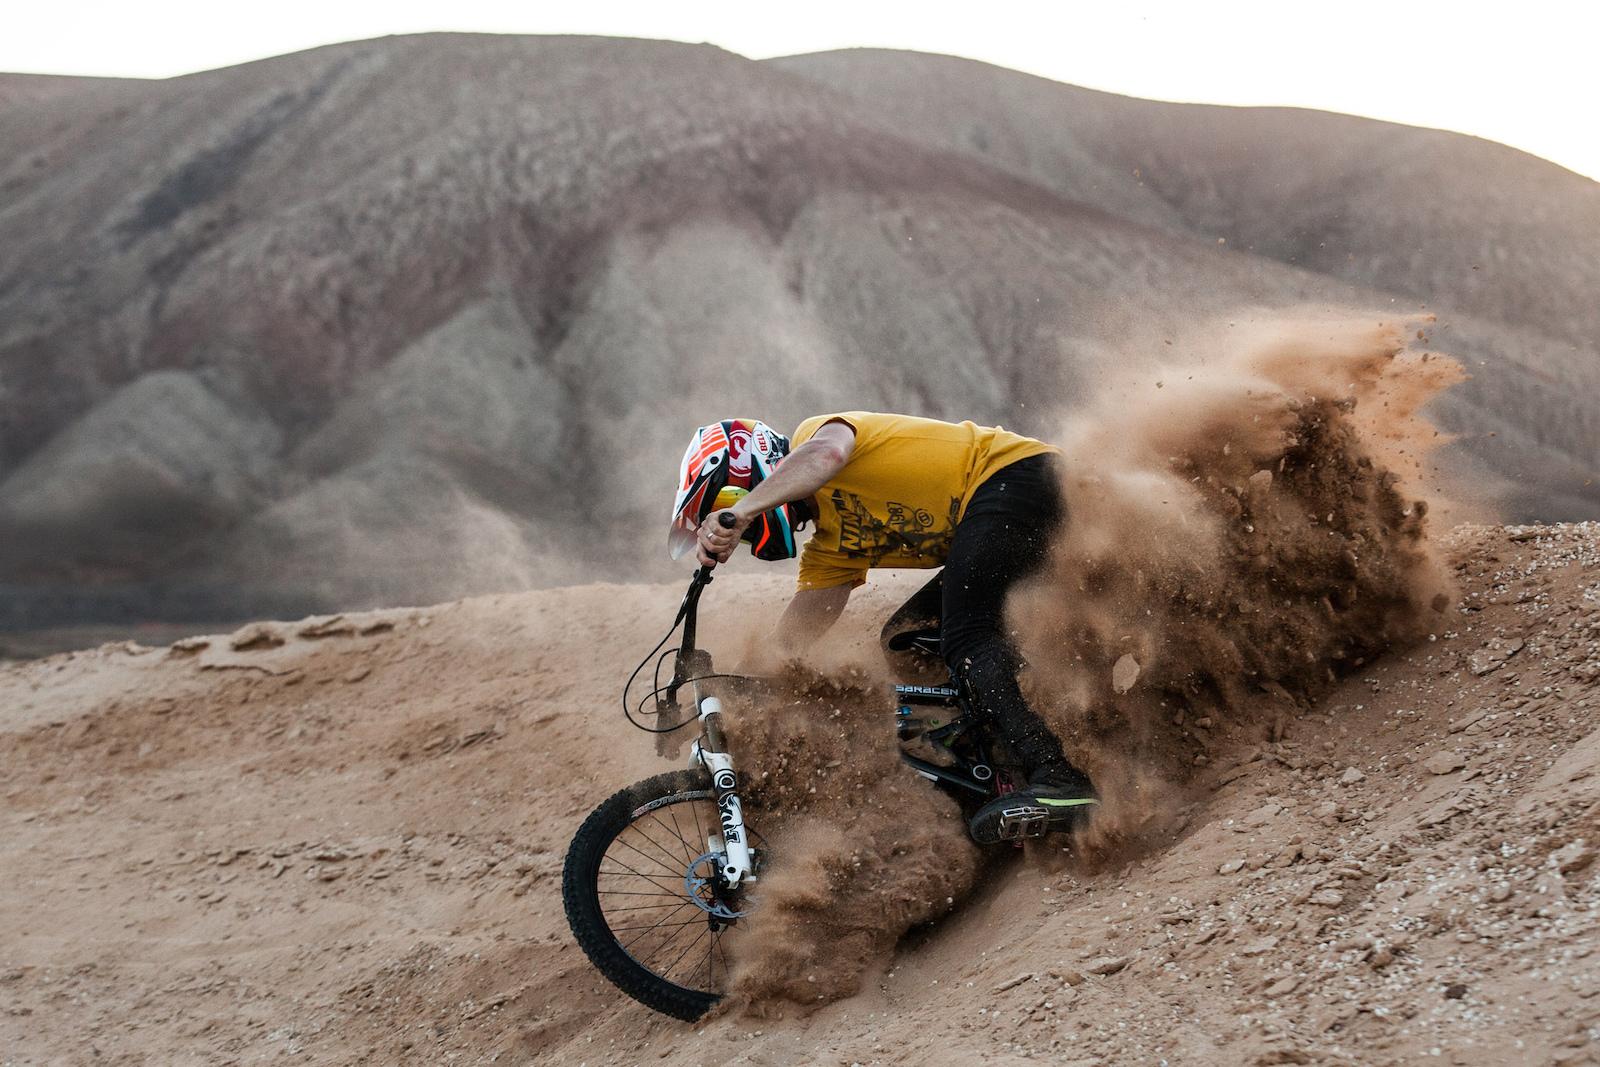 shredding dirt into dust saracen 2014 catalogue